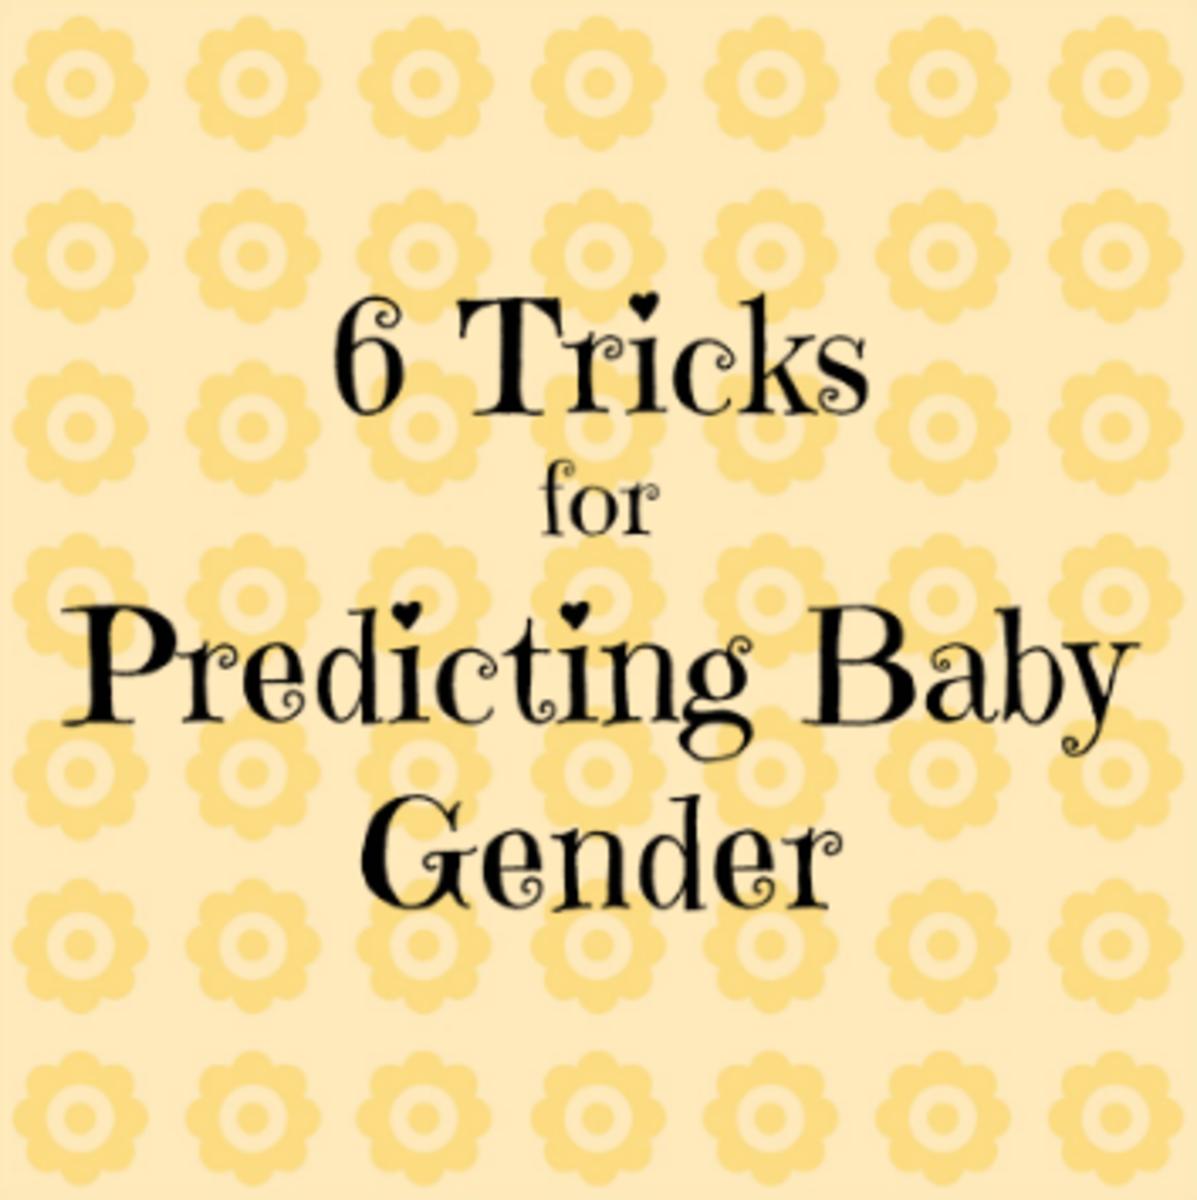 6 Tricks for Predicting Baby Gender